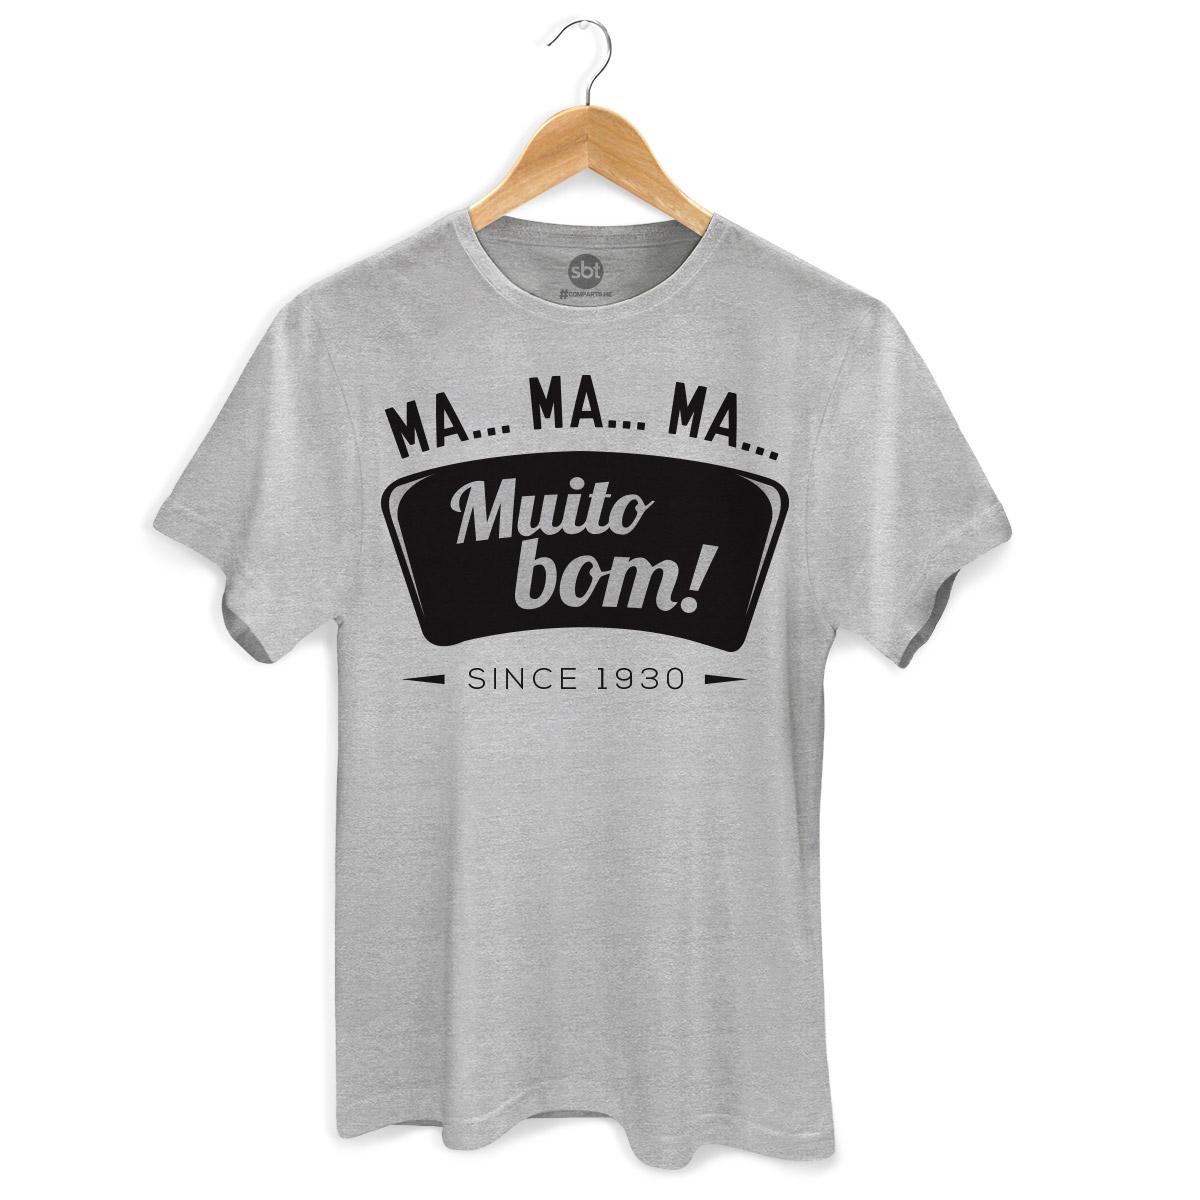 Camiseta Masculina SBT Muito Bom!